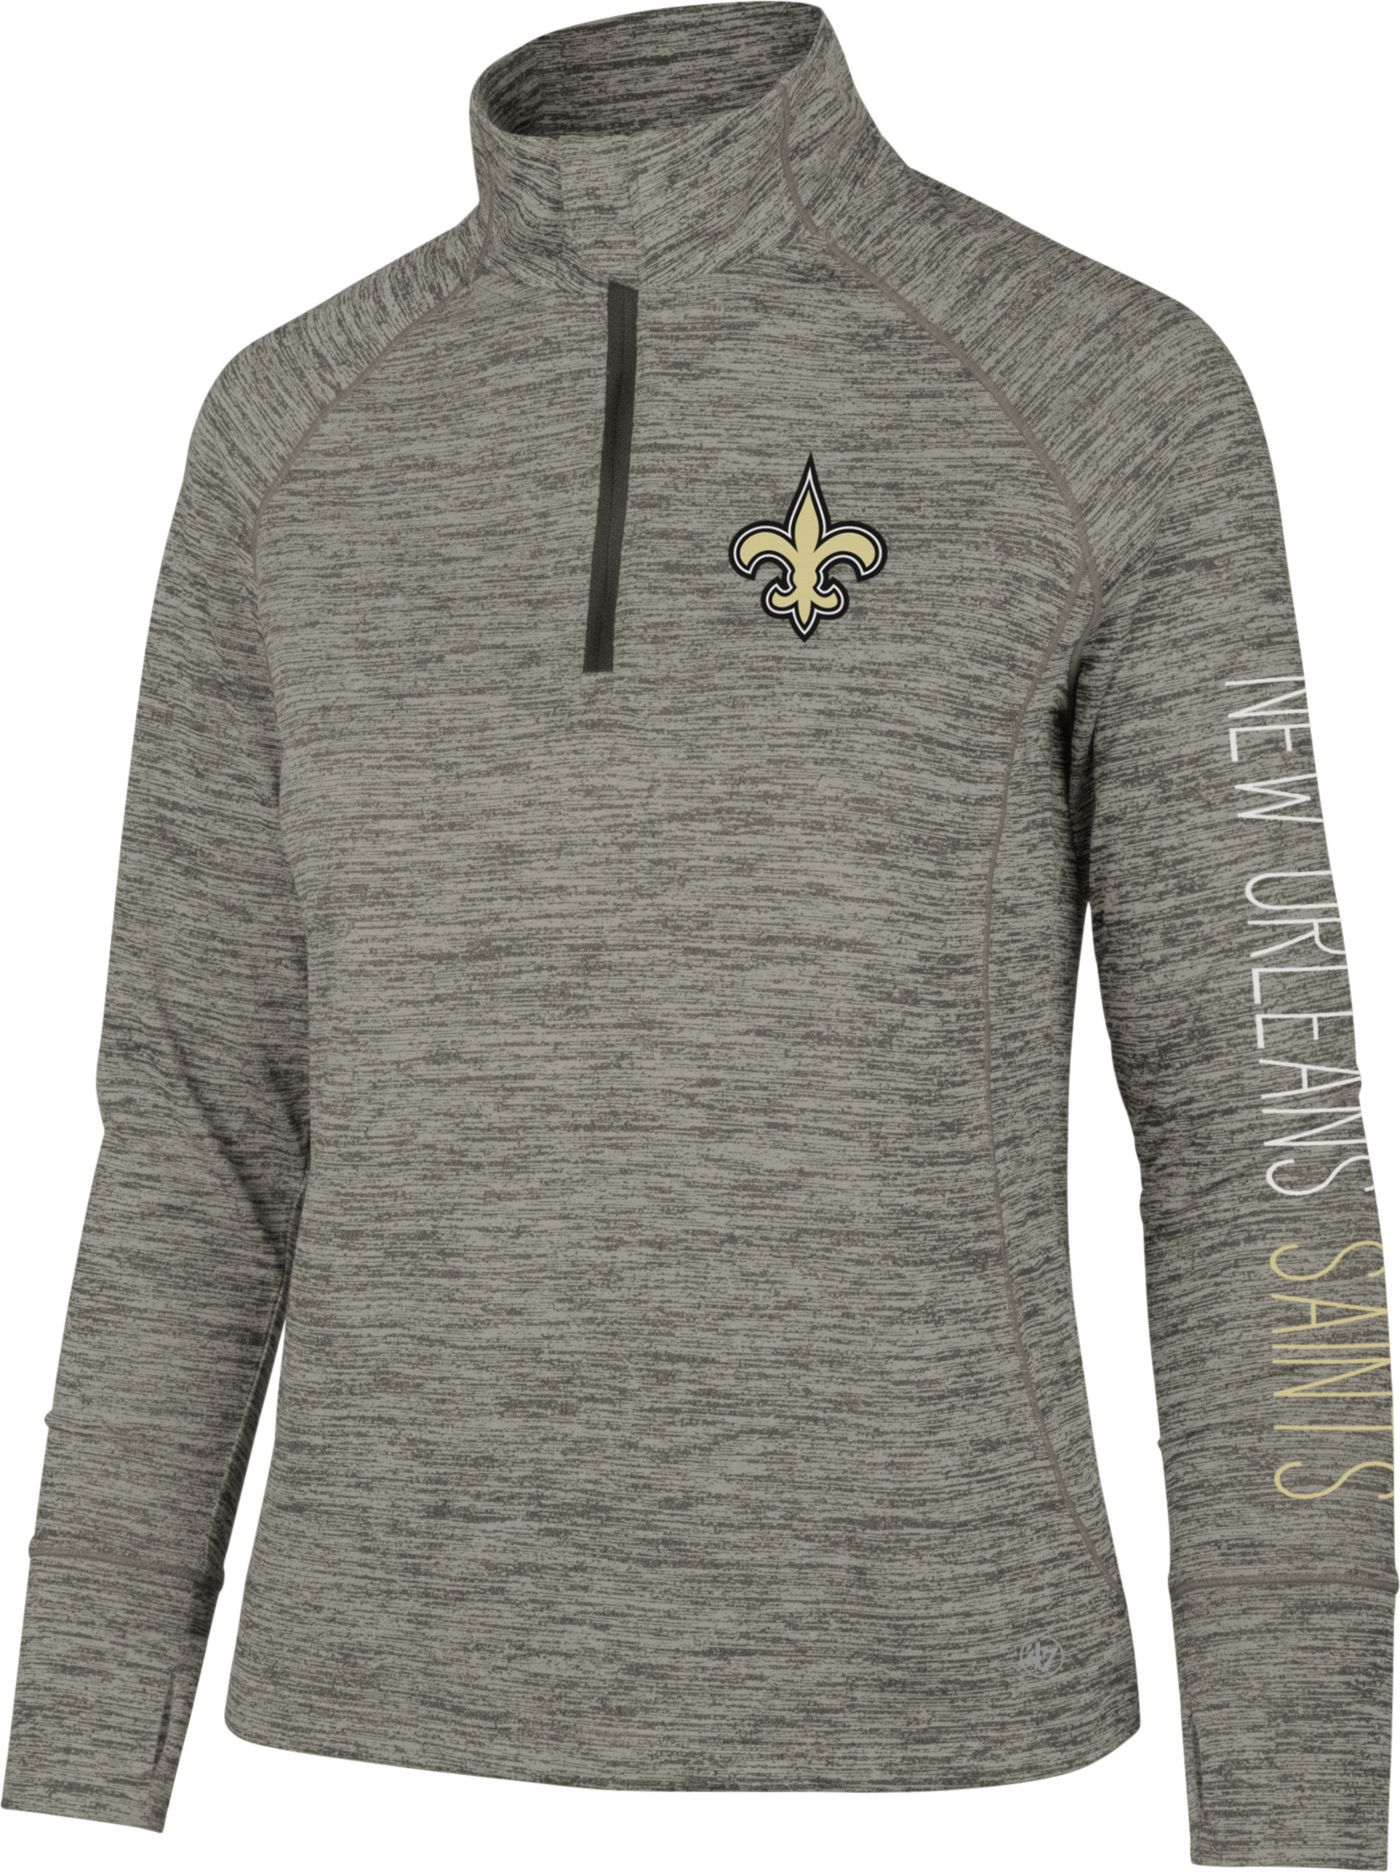 '47 Women's New Orleans Saints Impact Grey Quarter-Zip Pullover